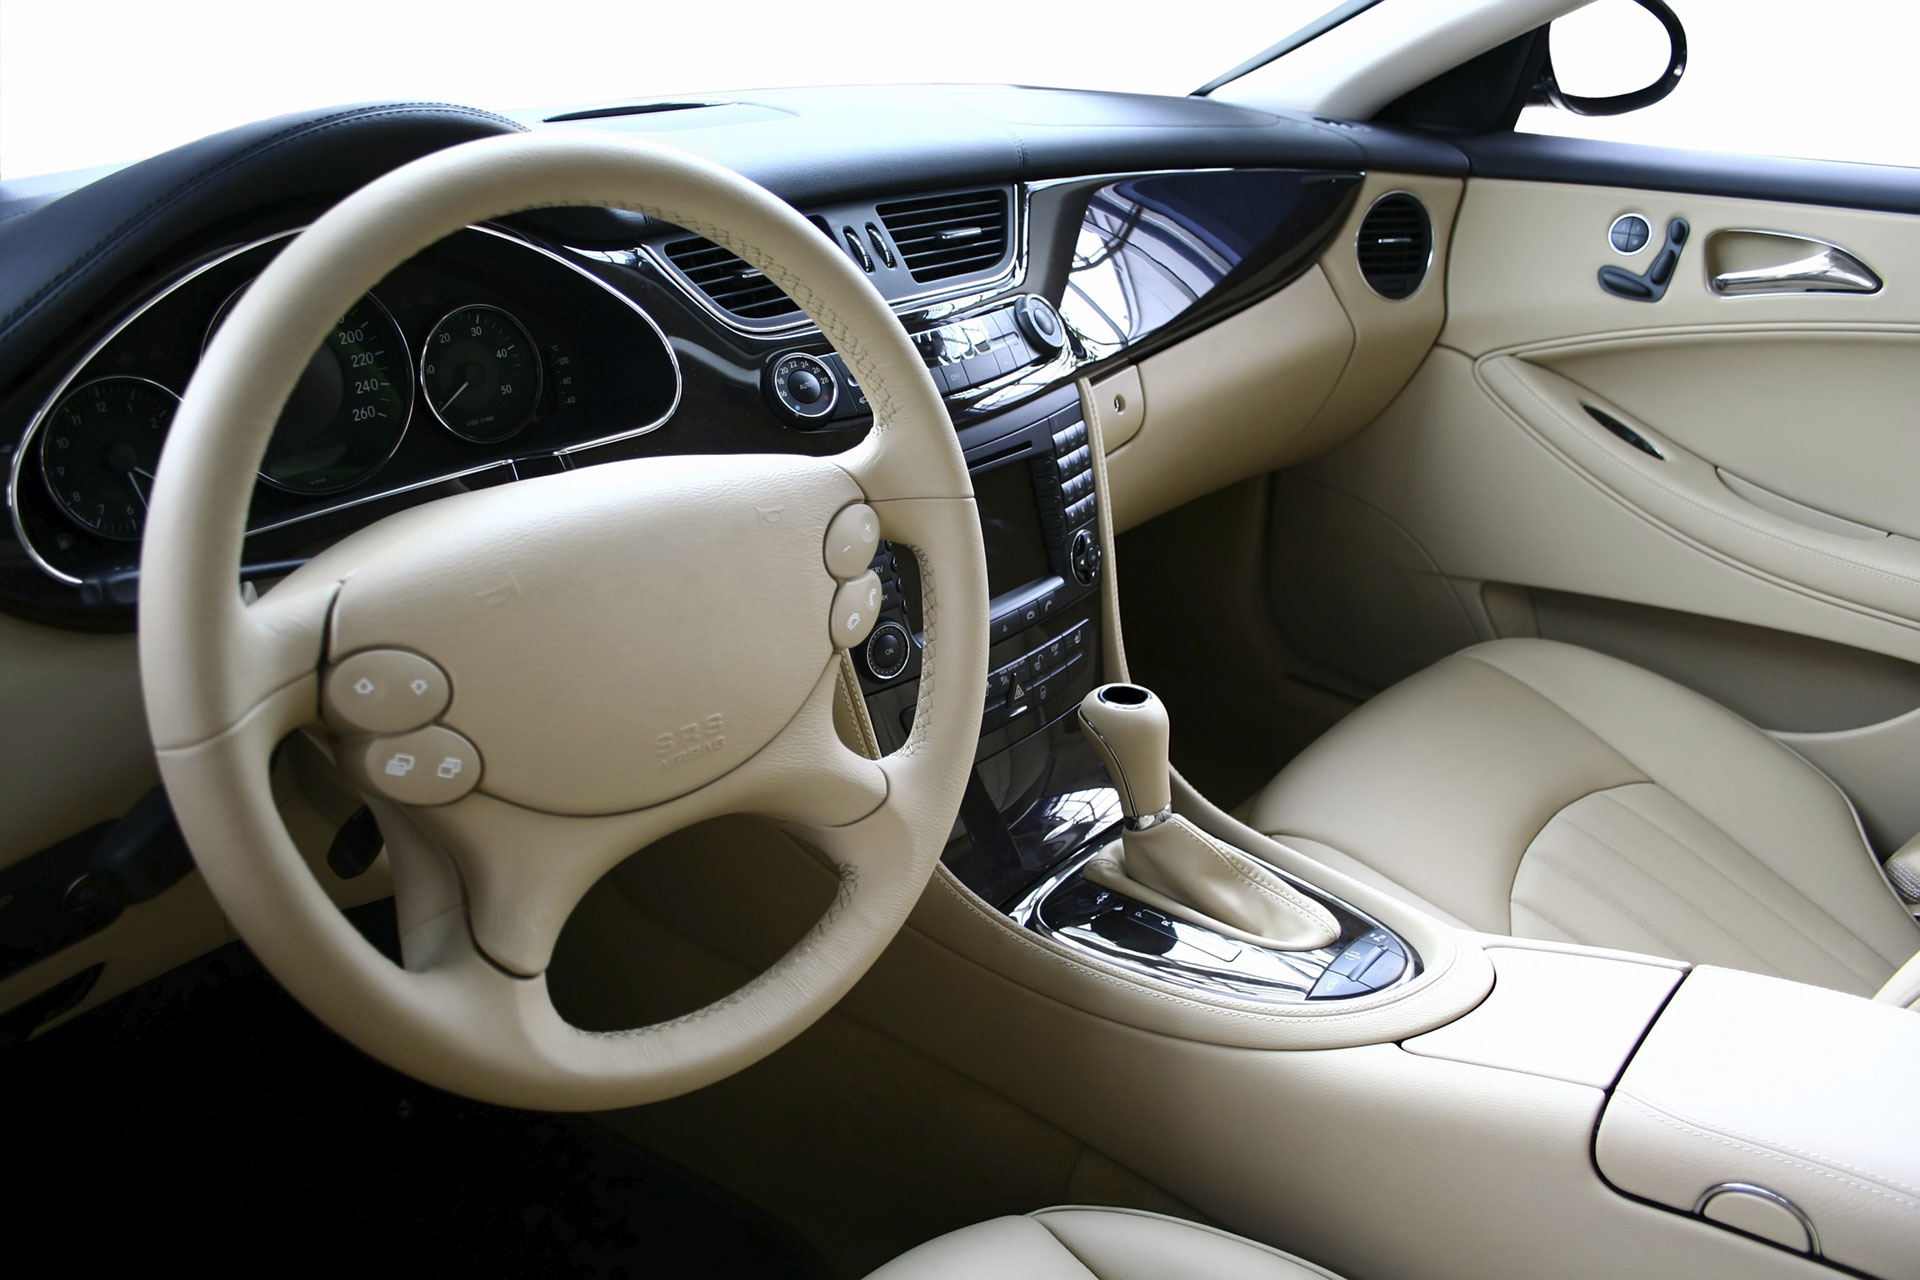 best odor eliminator for car interior - car interior odor removal